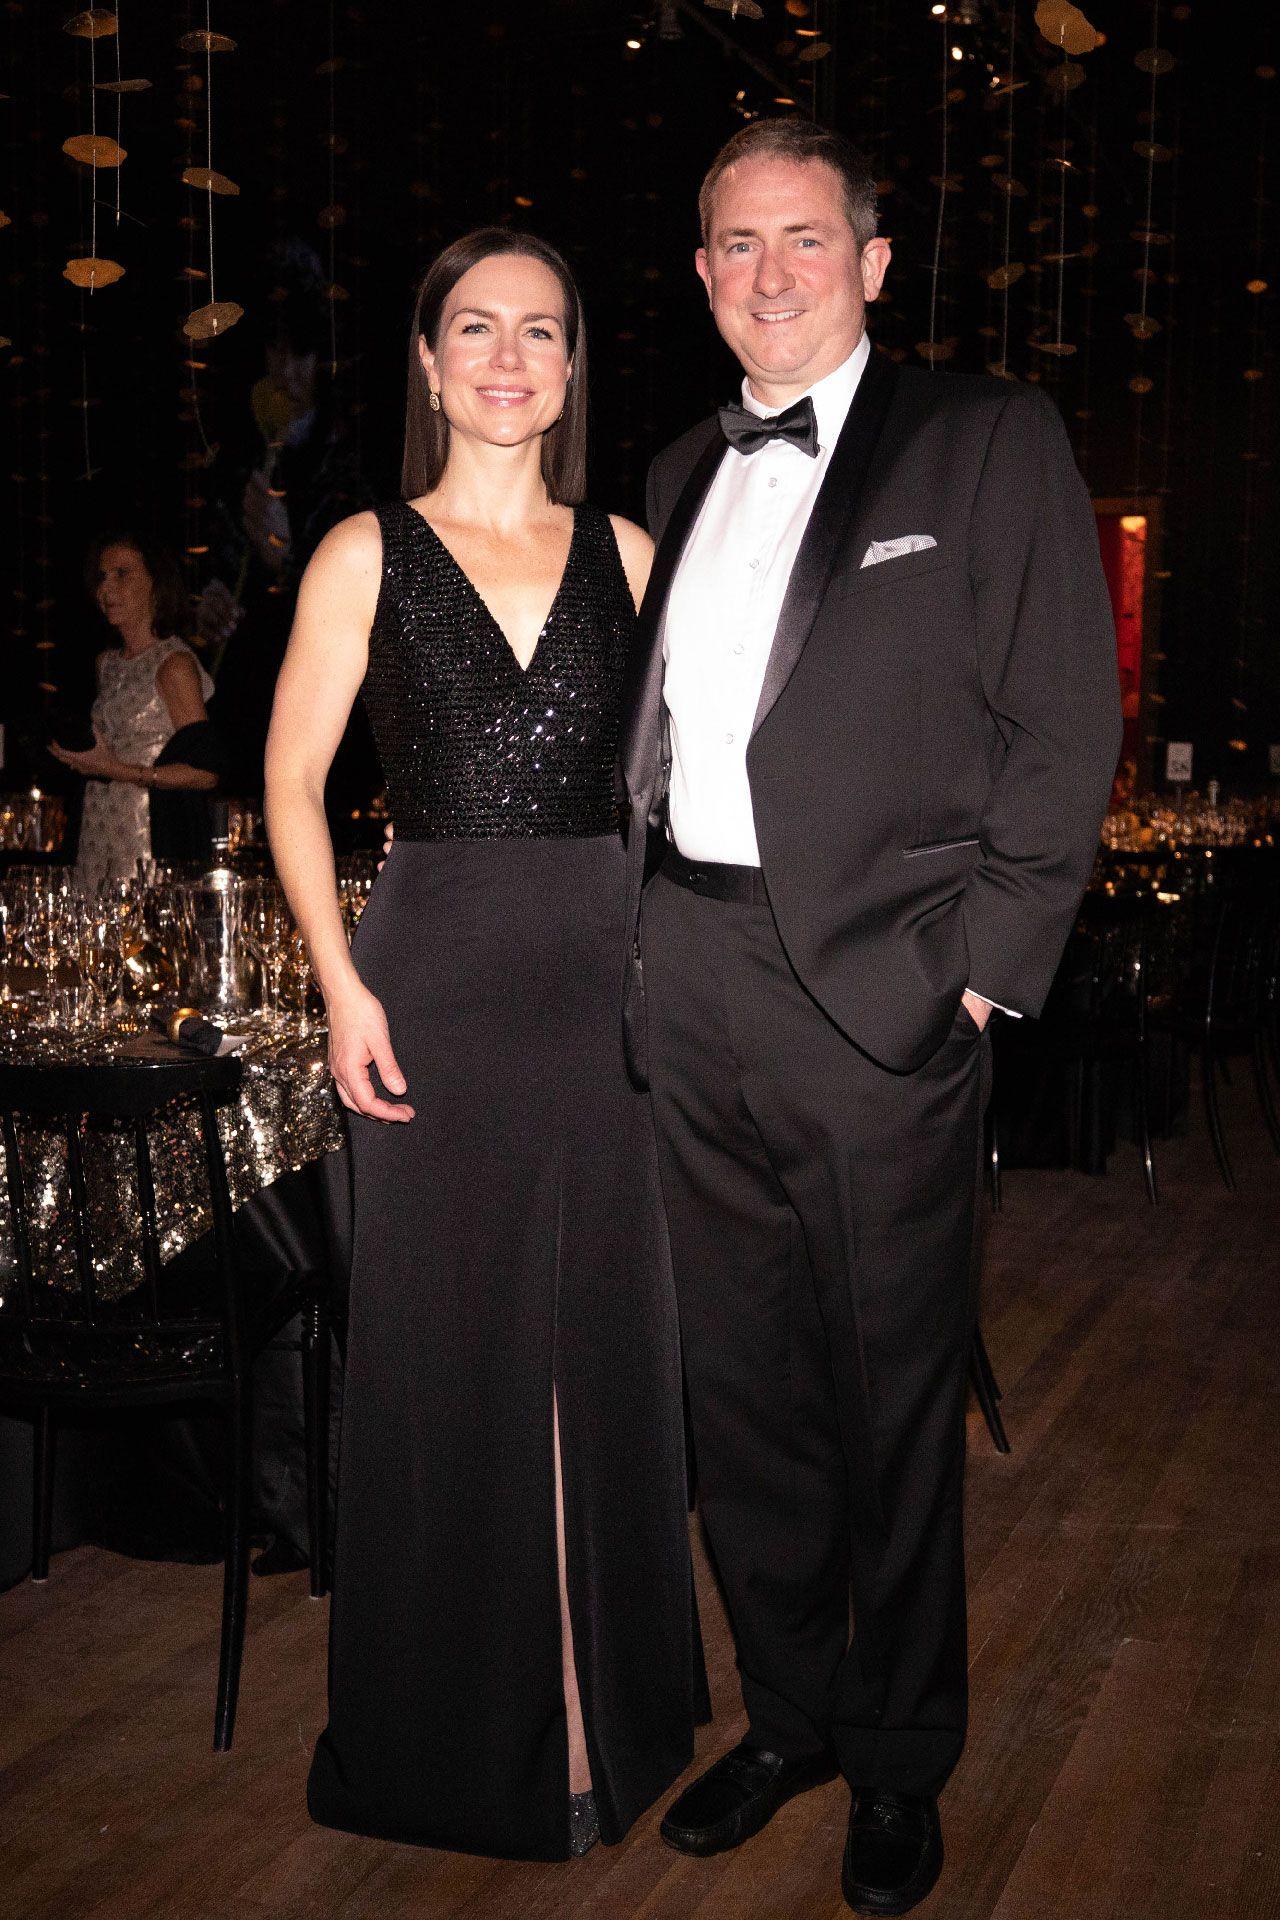 Nadine Renaud-Tinker et son conjoint. Photo © Jimmy Hamelin